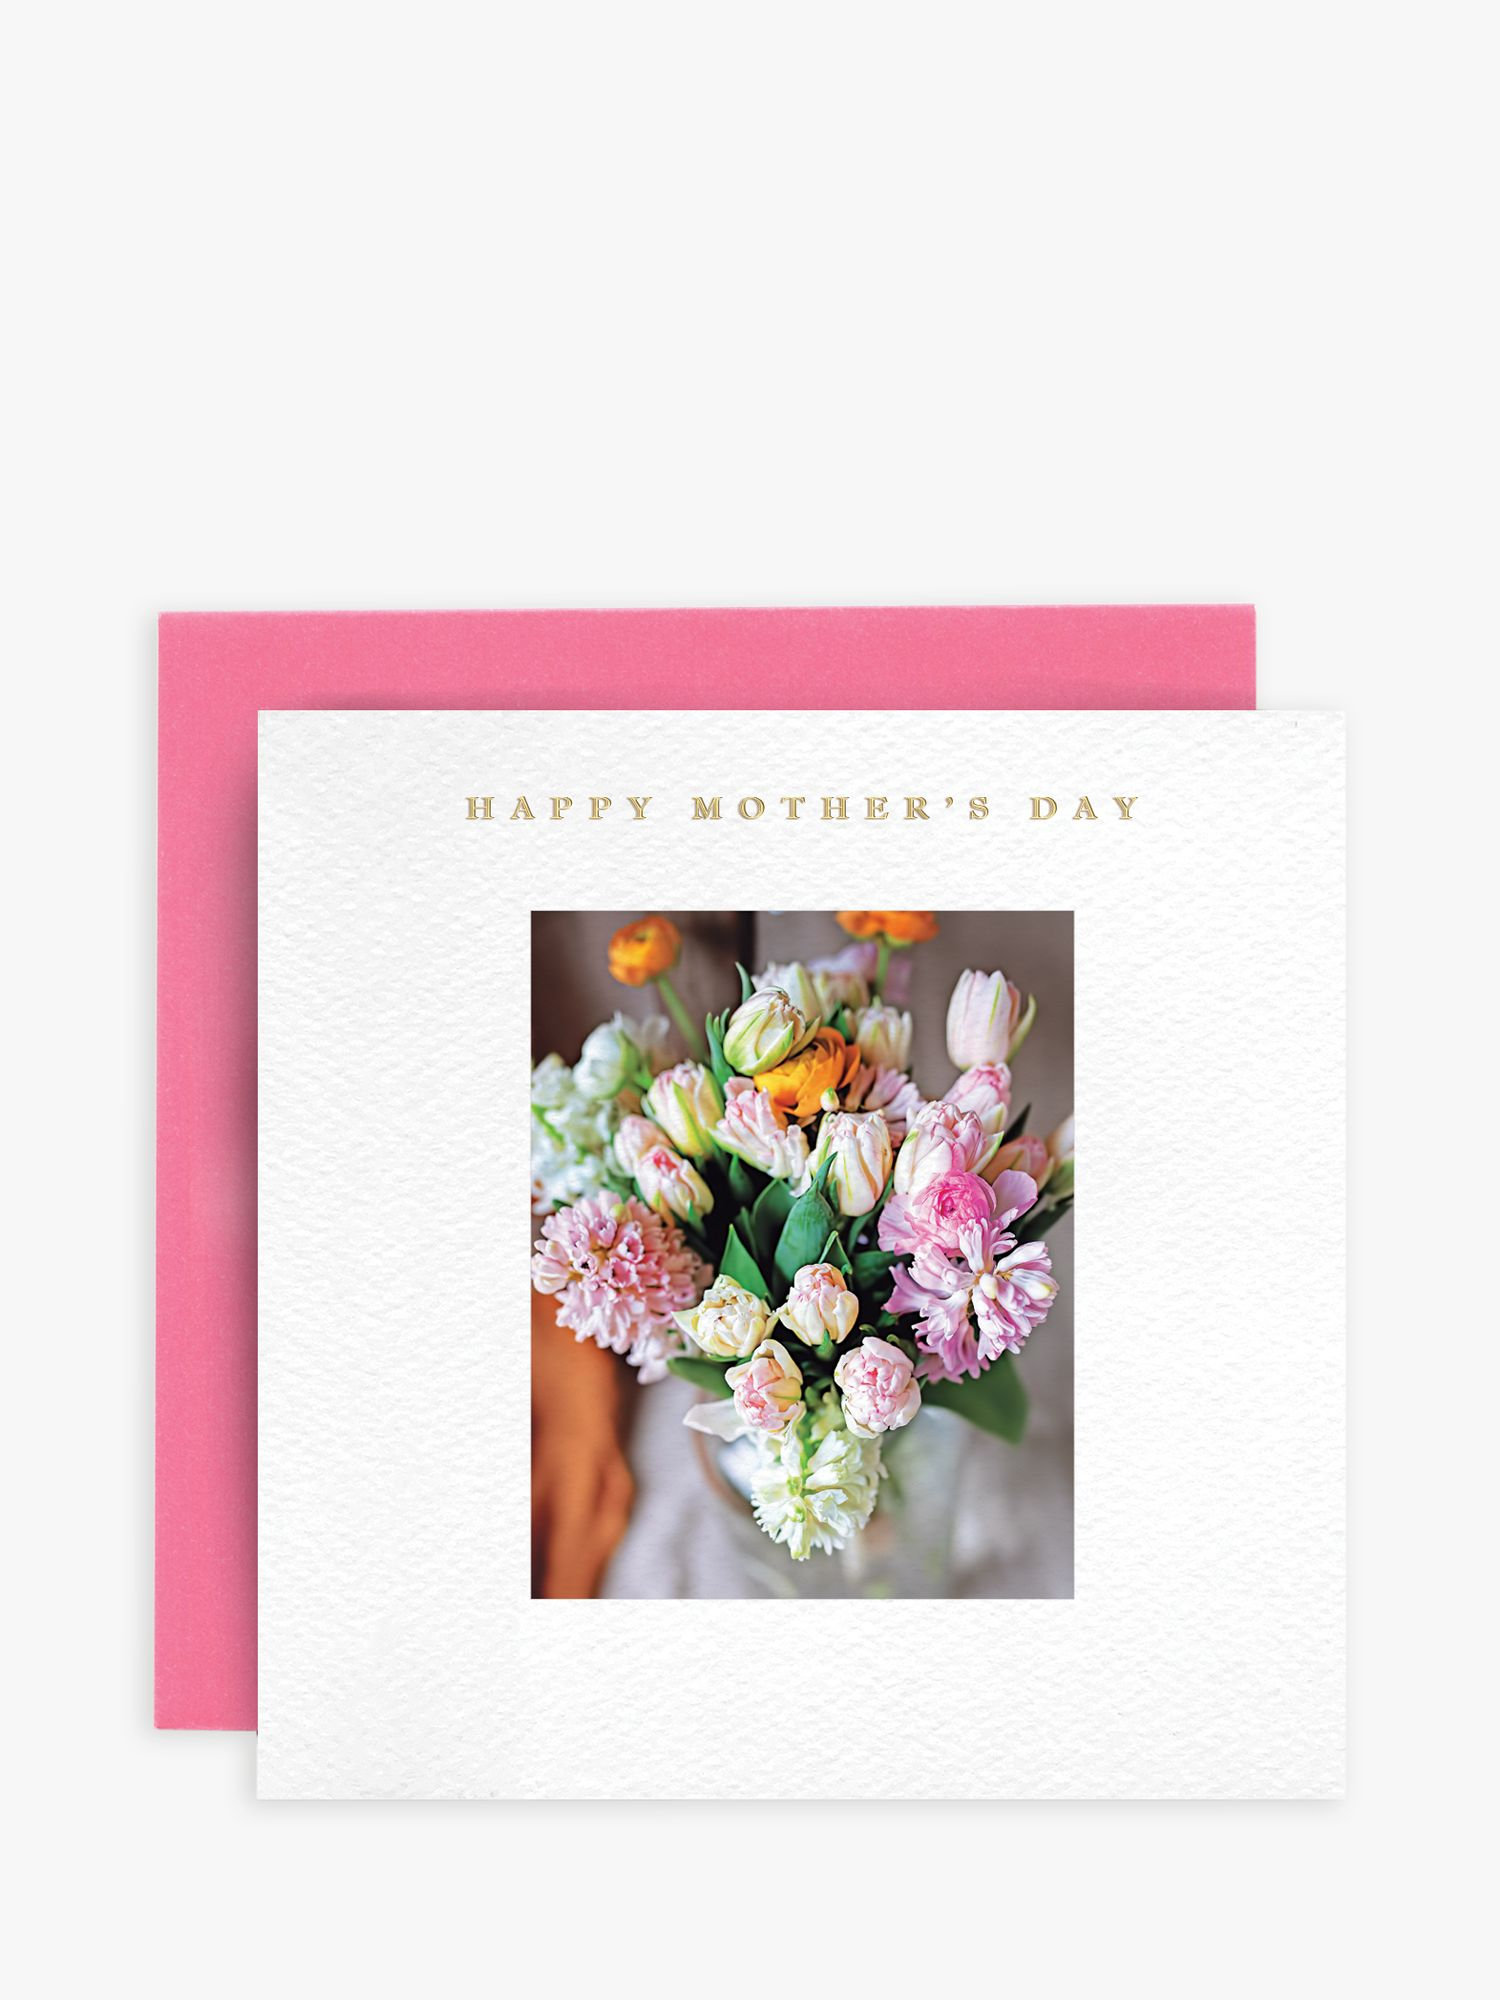 Susan O'Hanlon Susan O'Hanlon Spring Flowers Mother's Day Card